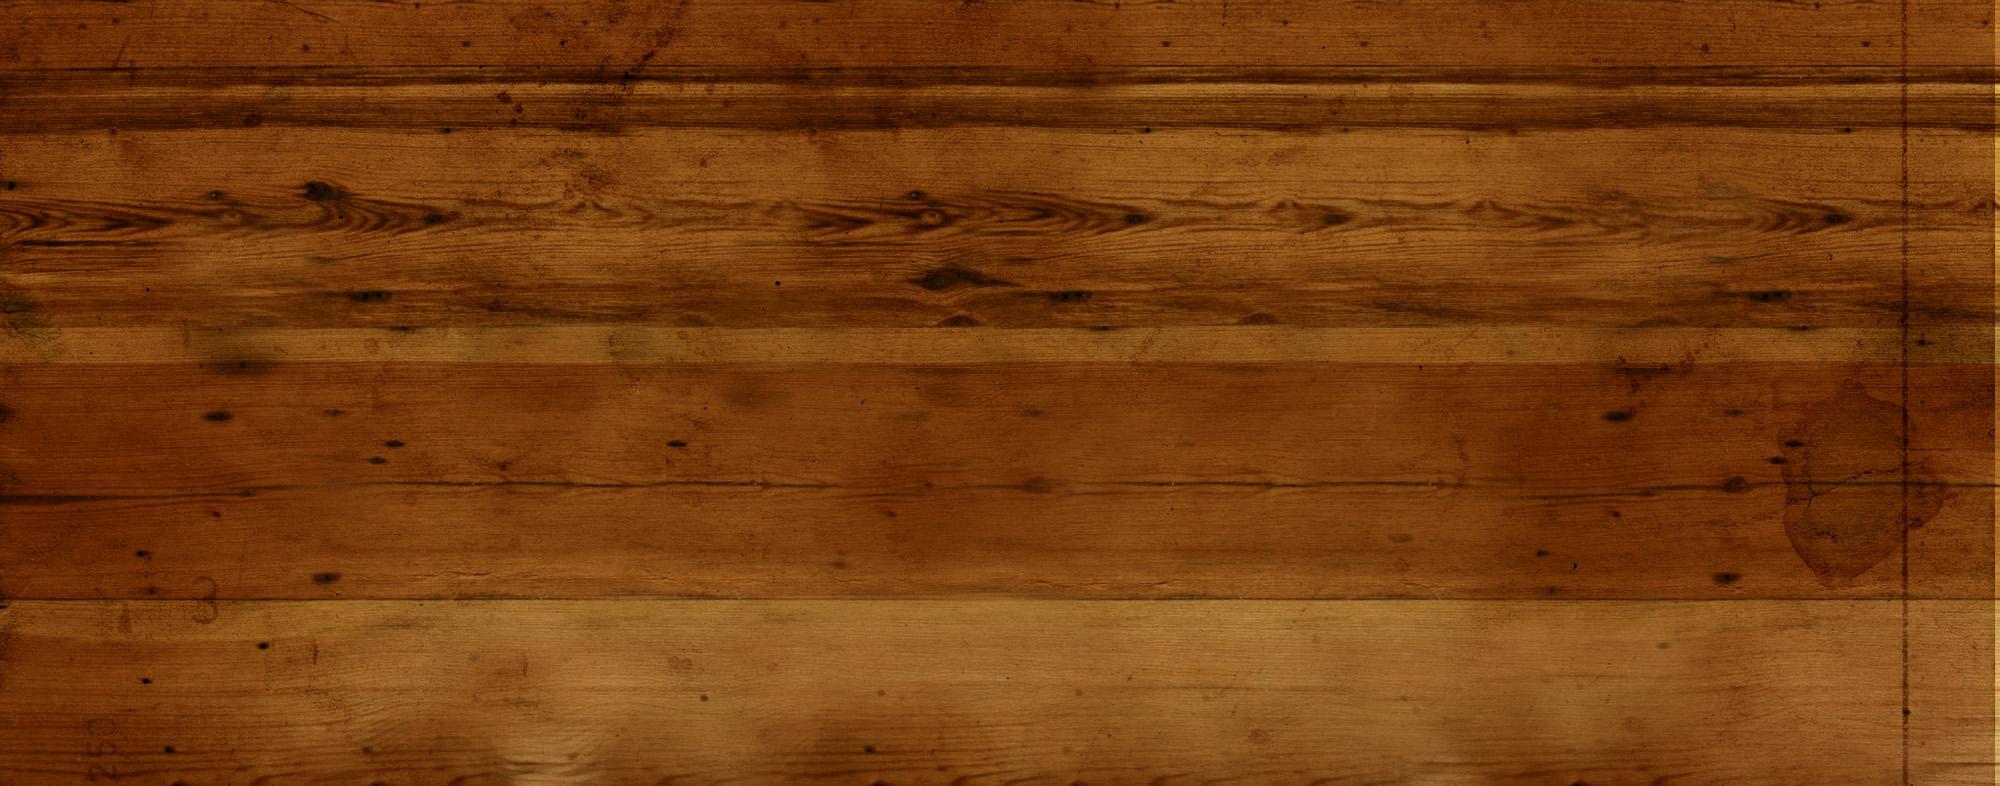 Horizontal Dark Wood Background - 470.6KB